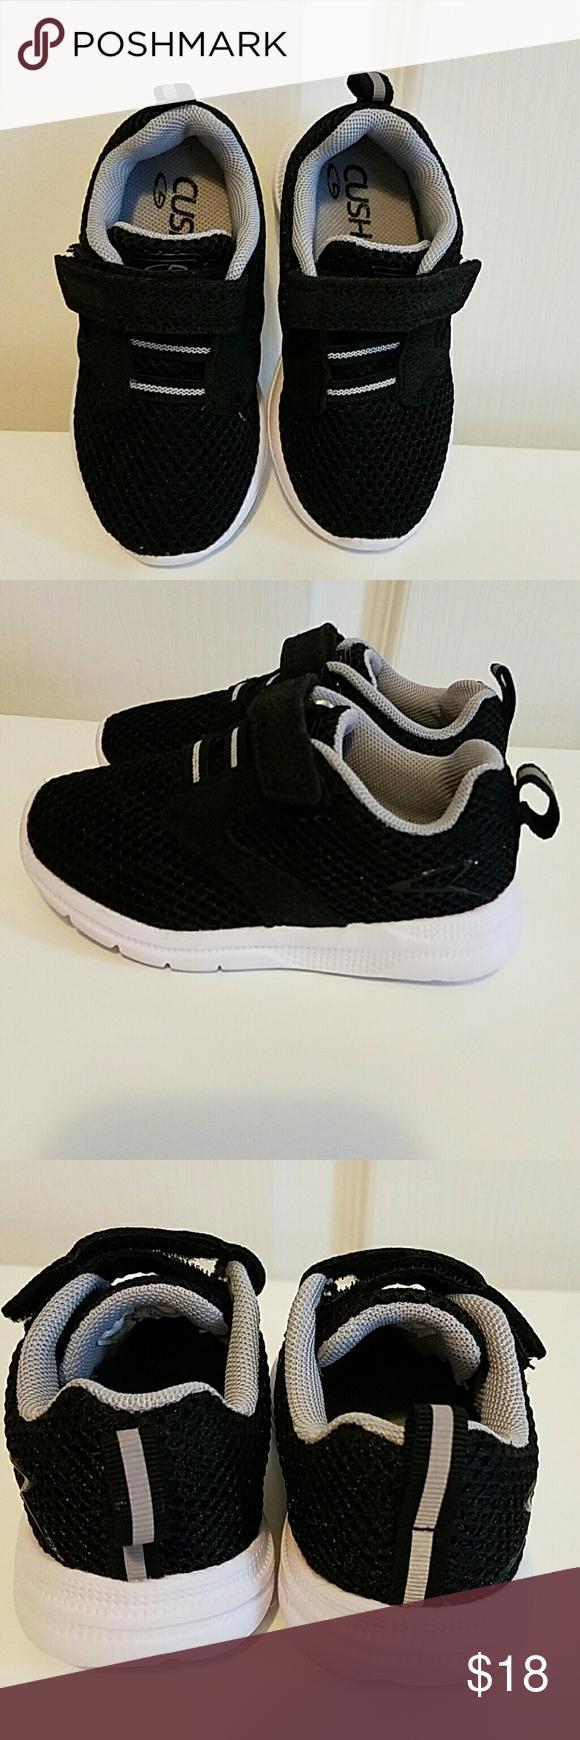 c4bf4ec2f4cb NWOT Champion shoes. Champion ShoesAthletic ShoesShoe BrandsShoes  SneakersBoysBrand New